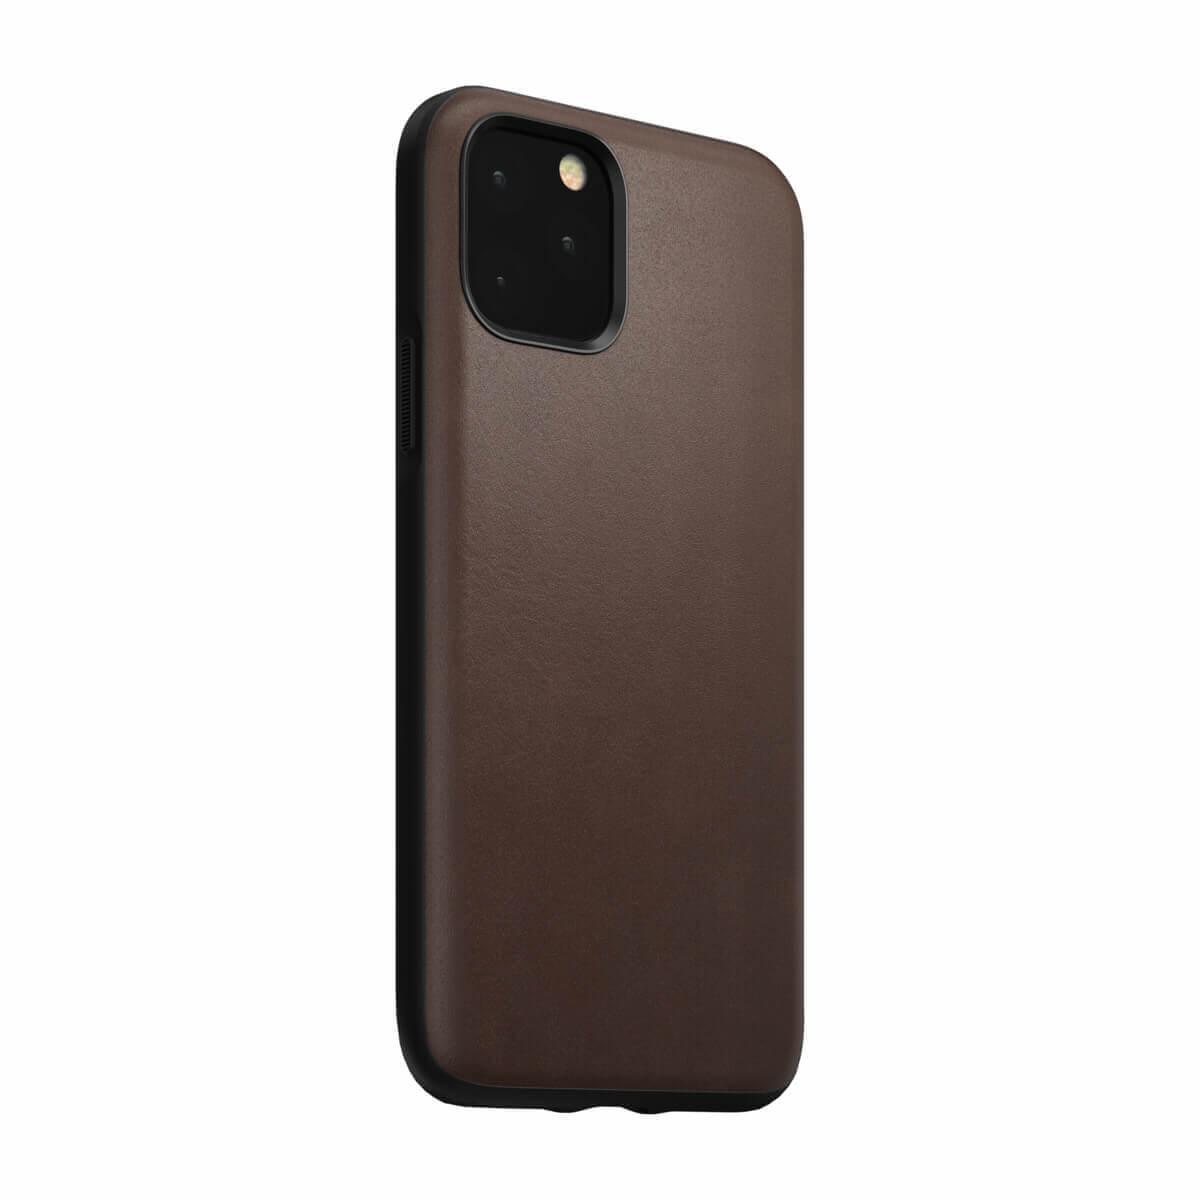 Nomad Leather Rugged Case — кожен (естествена кожа) кейс за iPhone 11 Pro (кафяв) - 3